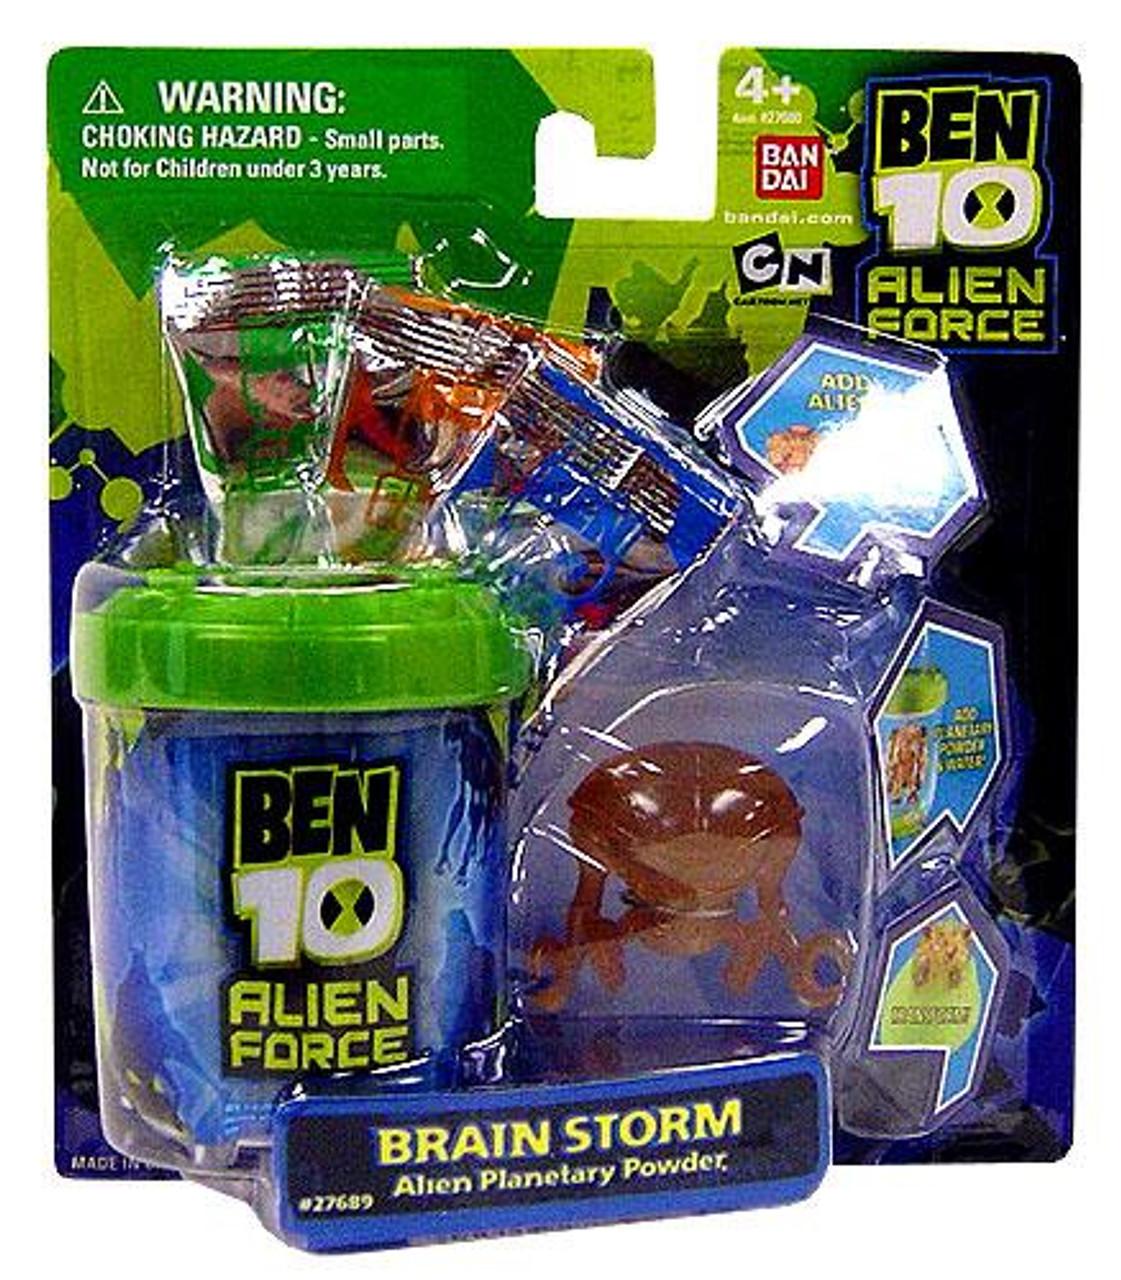 Ben 10 Alien Force Brainstorm Planetary Powder Set